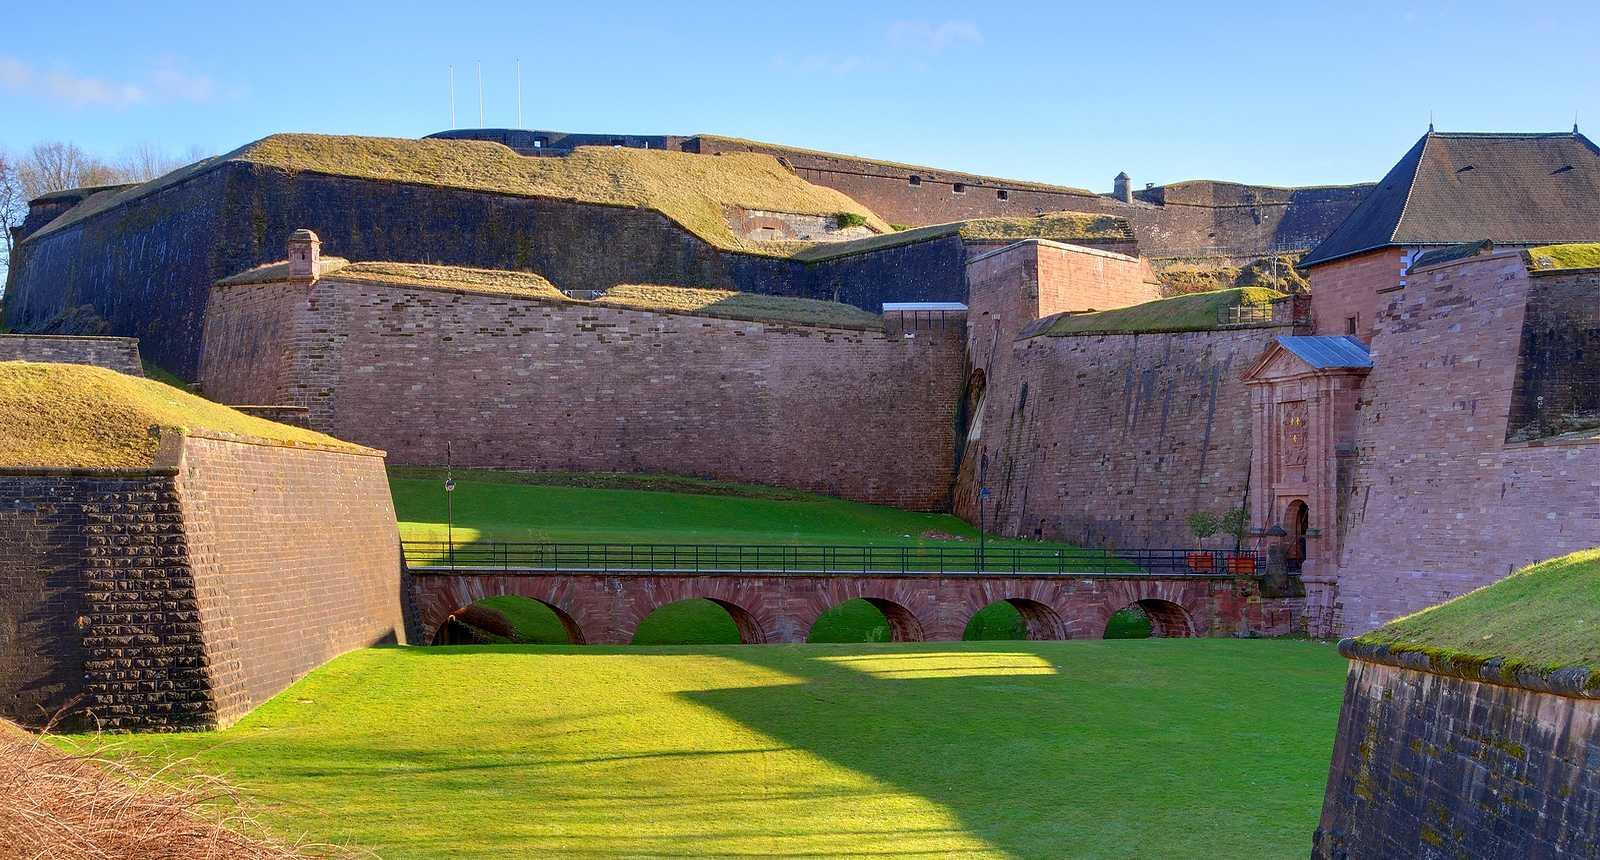 Les Fortifications de la Citadelle de Belfort (1)